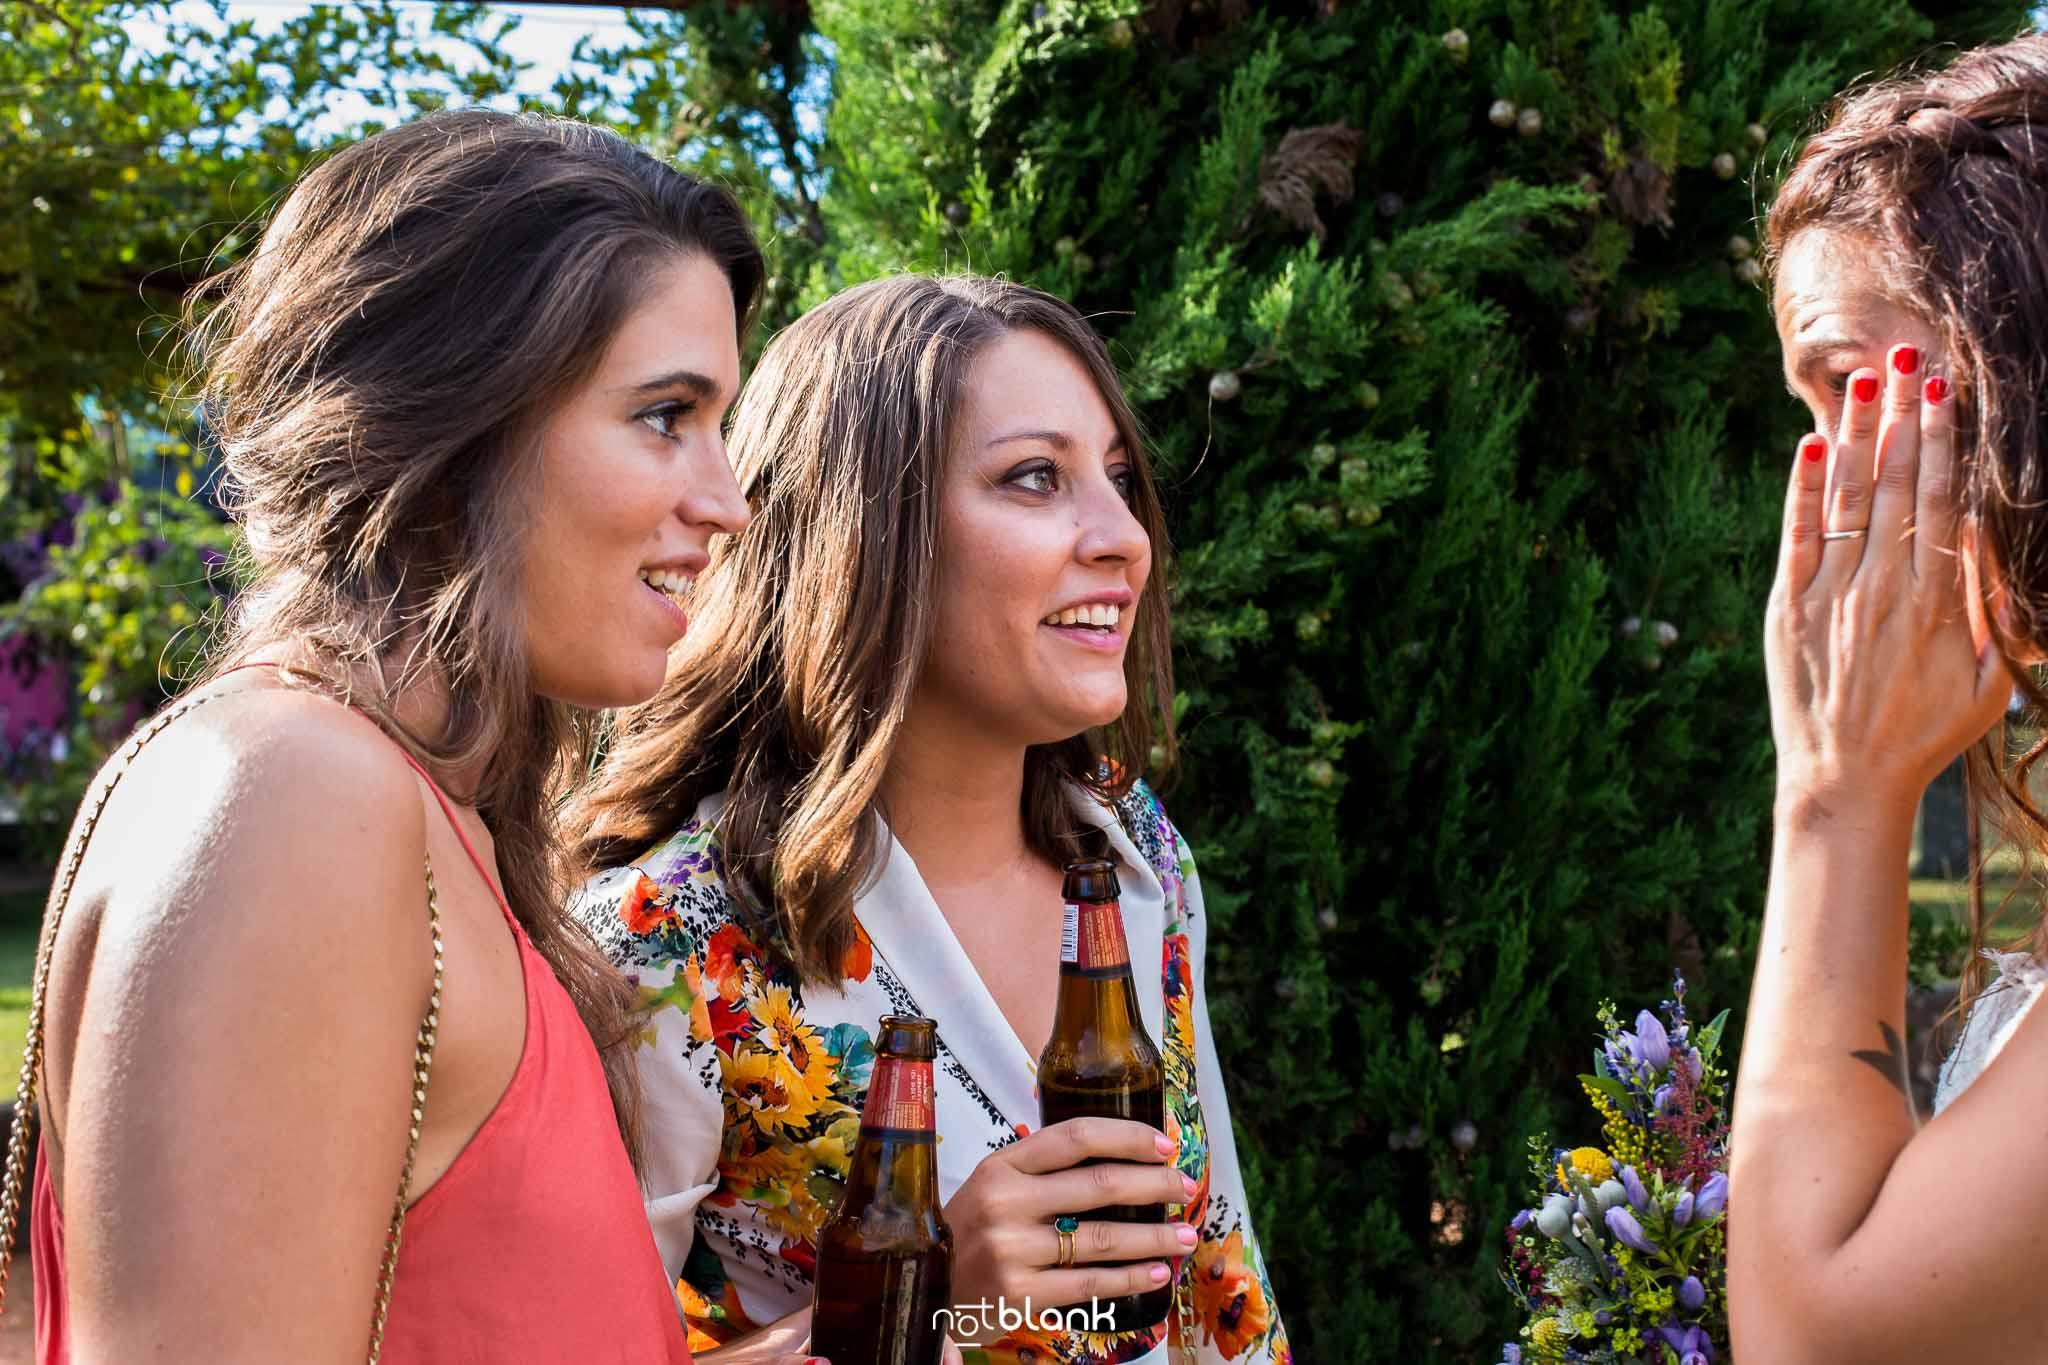 Notblank-Boda Tematica-Star Wars-Malaposta-Portugal-Fotógrafo de boda-Invitados-Emoción-Sonrisa-Cerveza